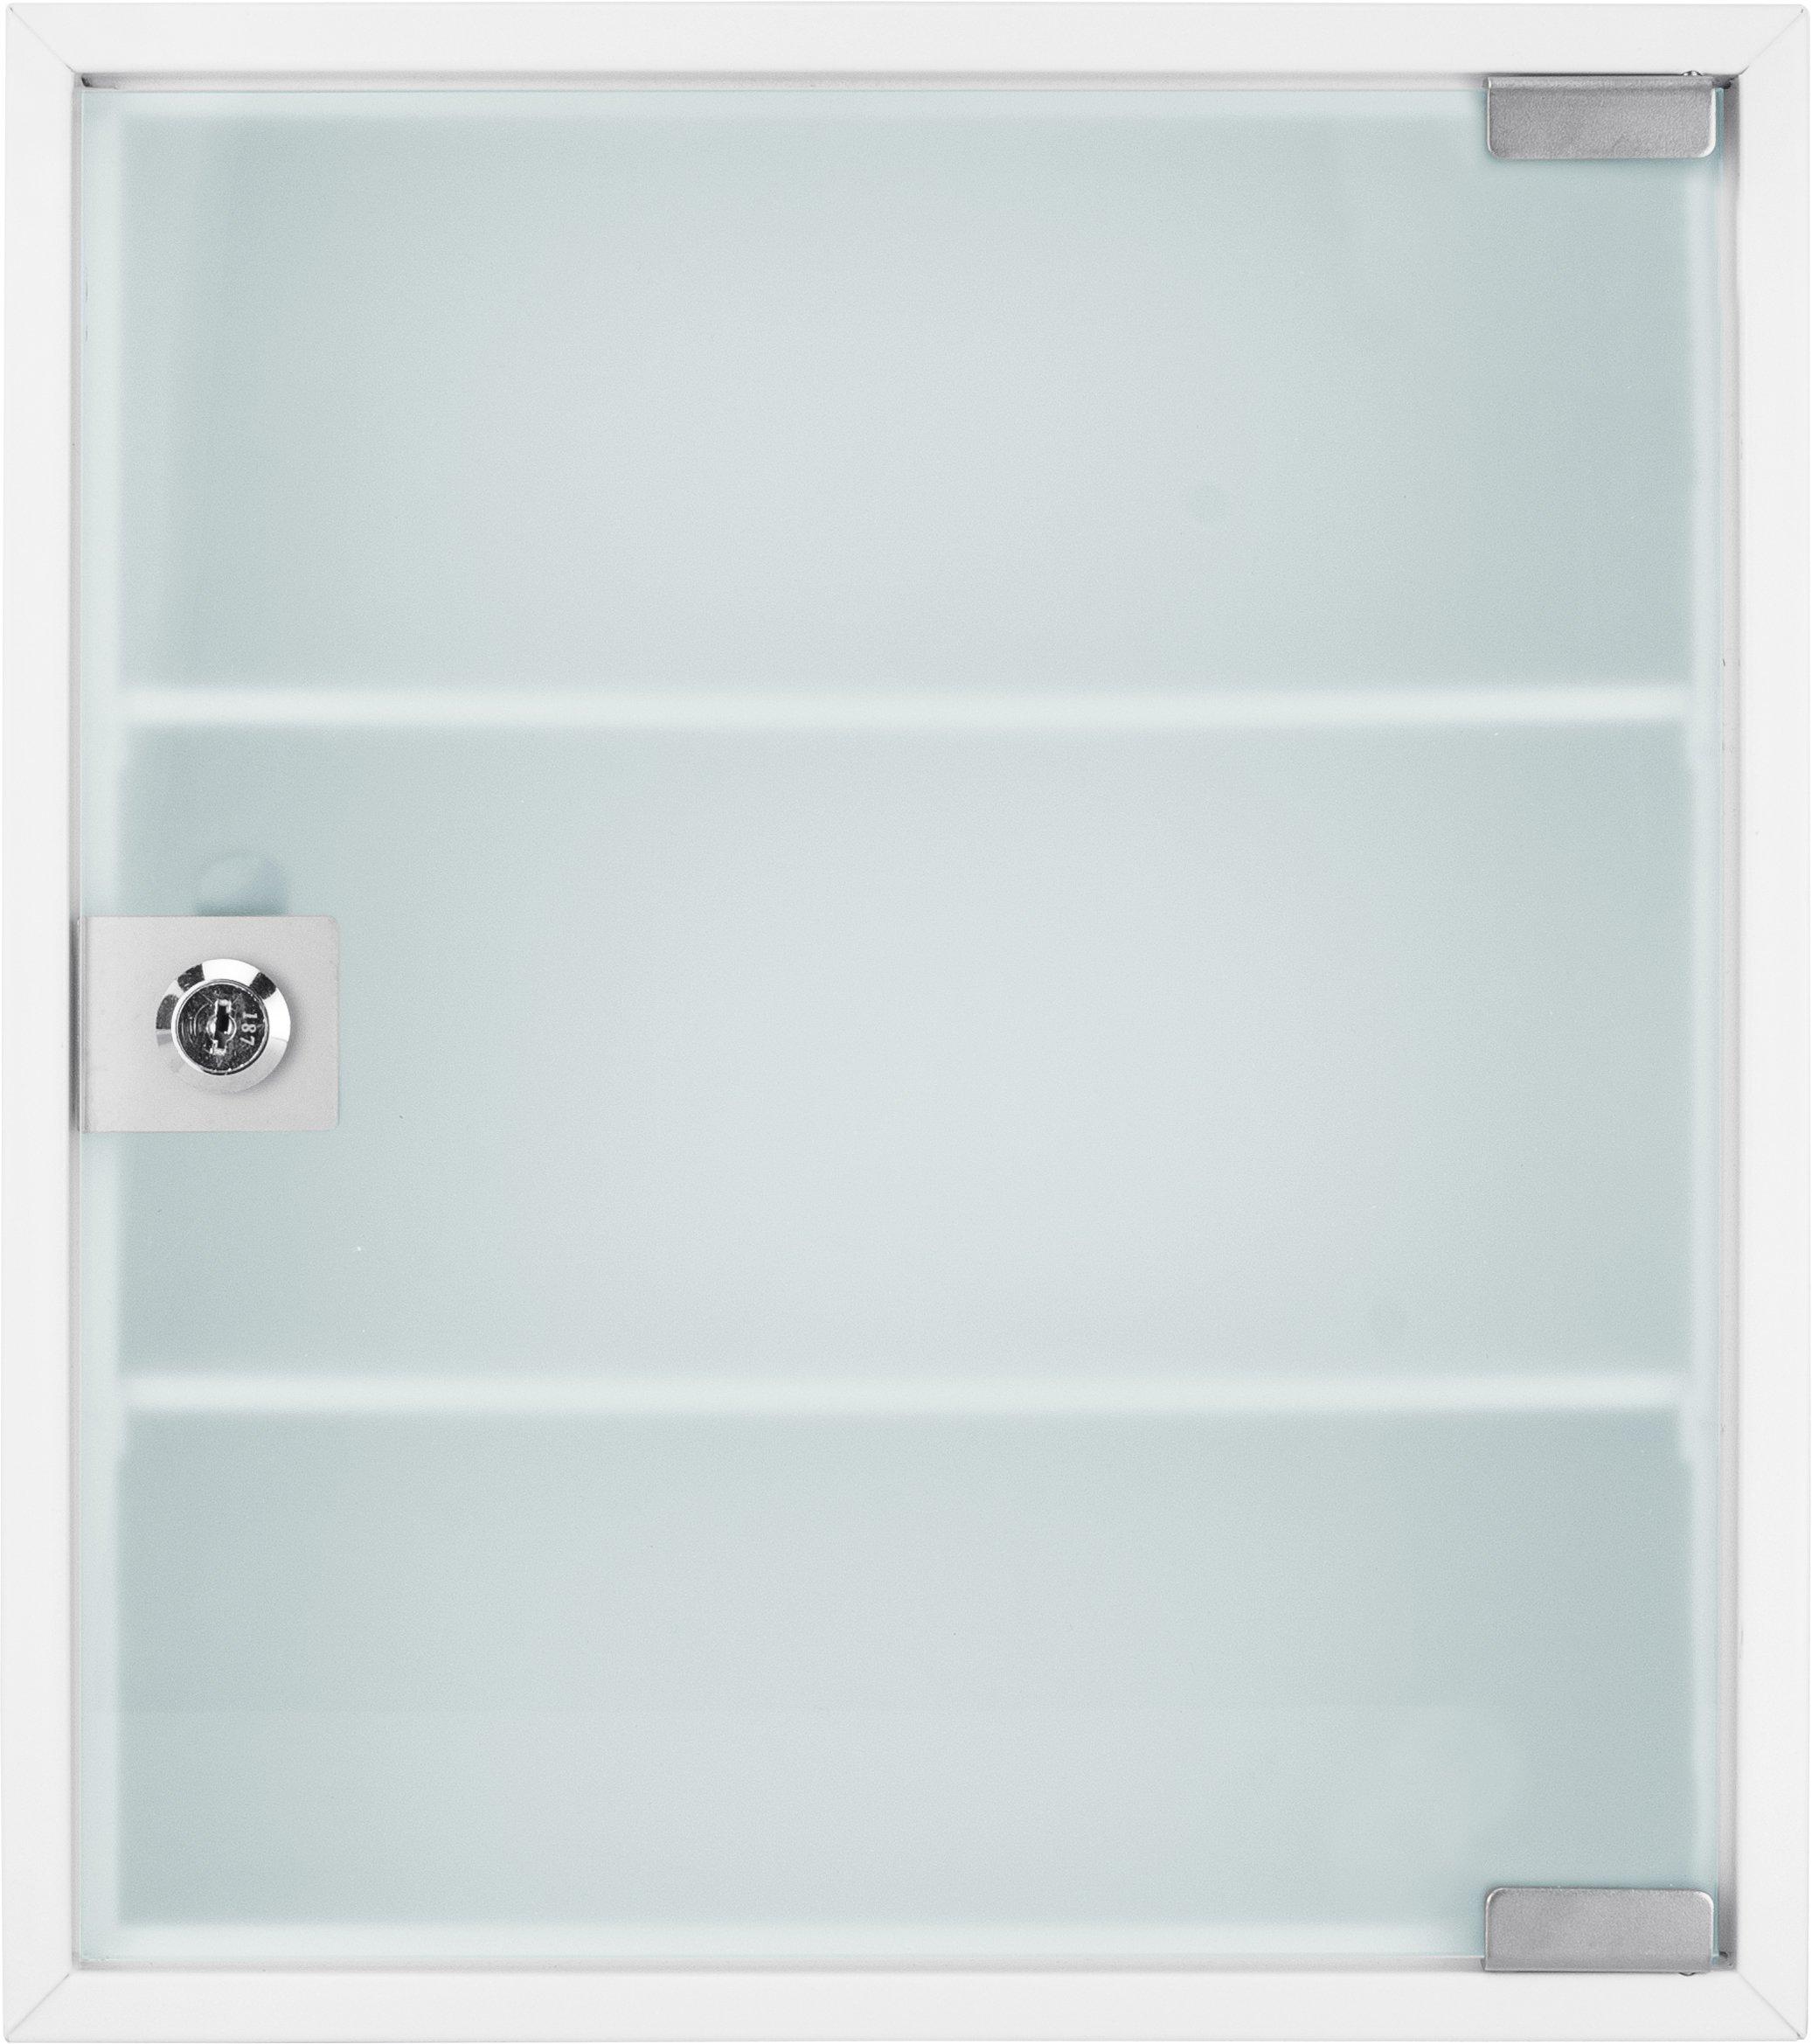 Winbest Large Wall Mount Steel Medical Medicine Storage Cabinet with Glass Door